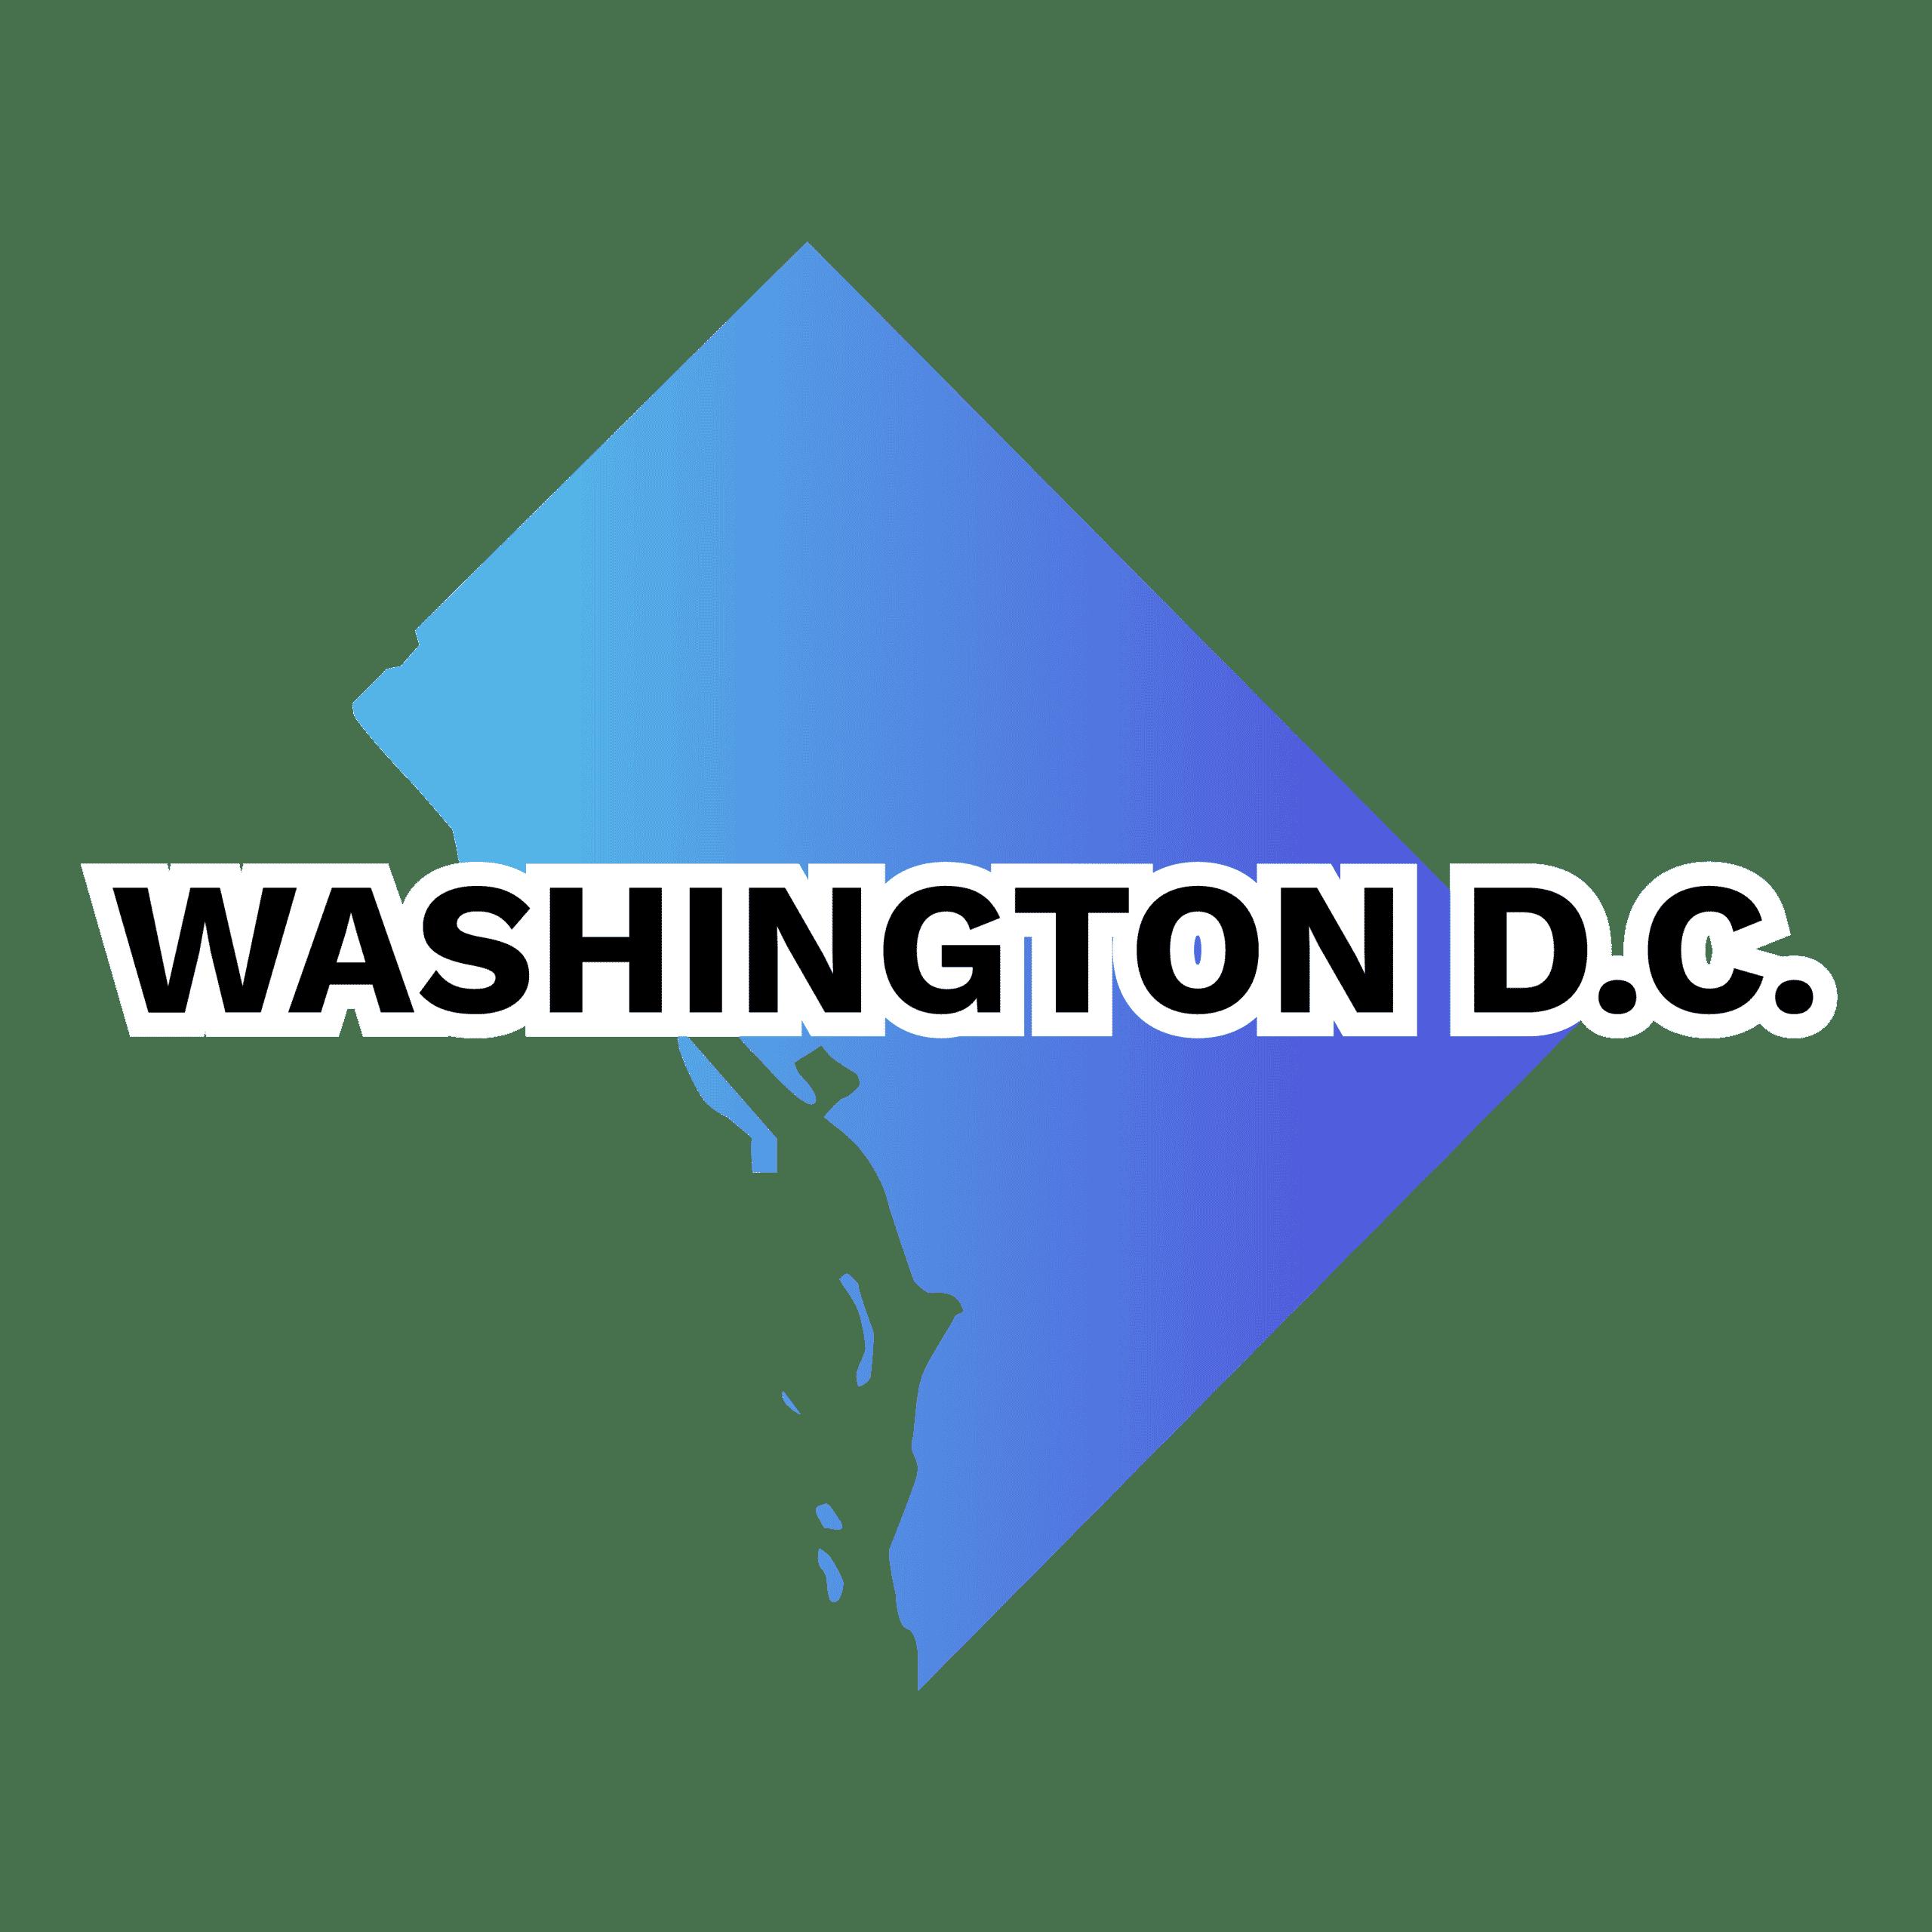 Washington D.C. State Image